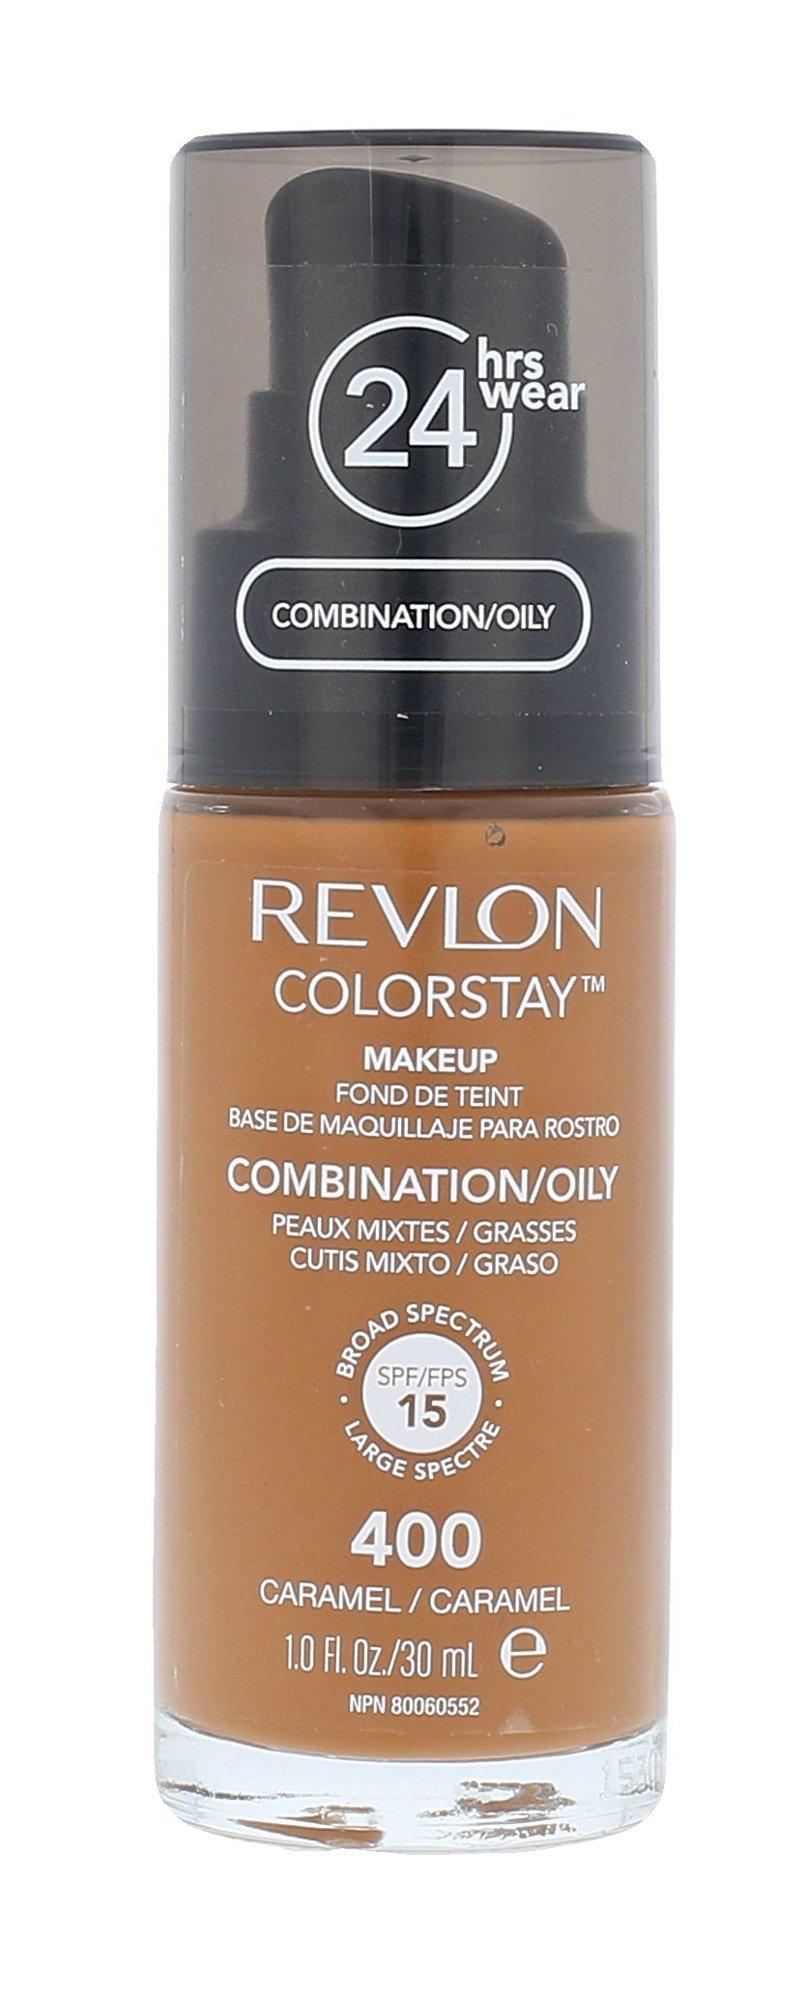 Revlon Colorstay Cosmetic 30ml 400 Caramel